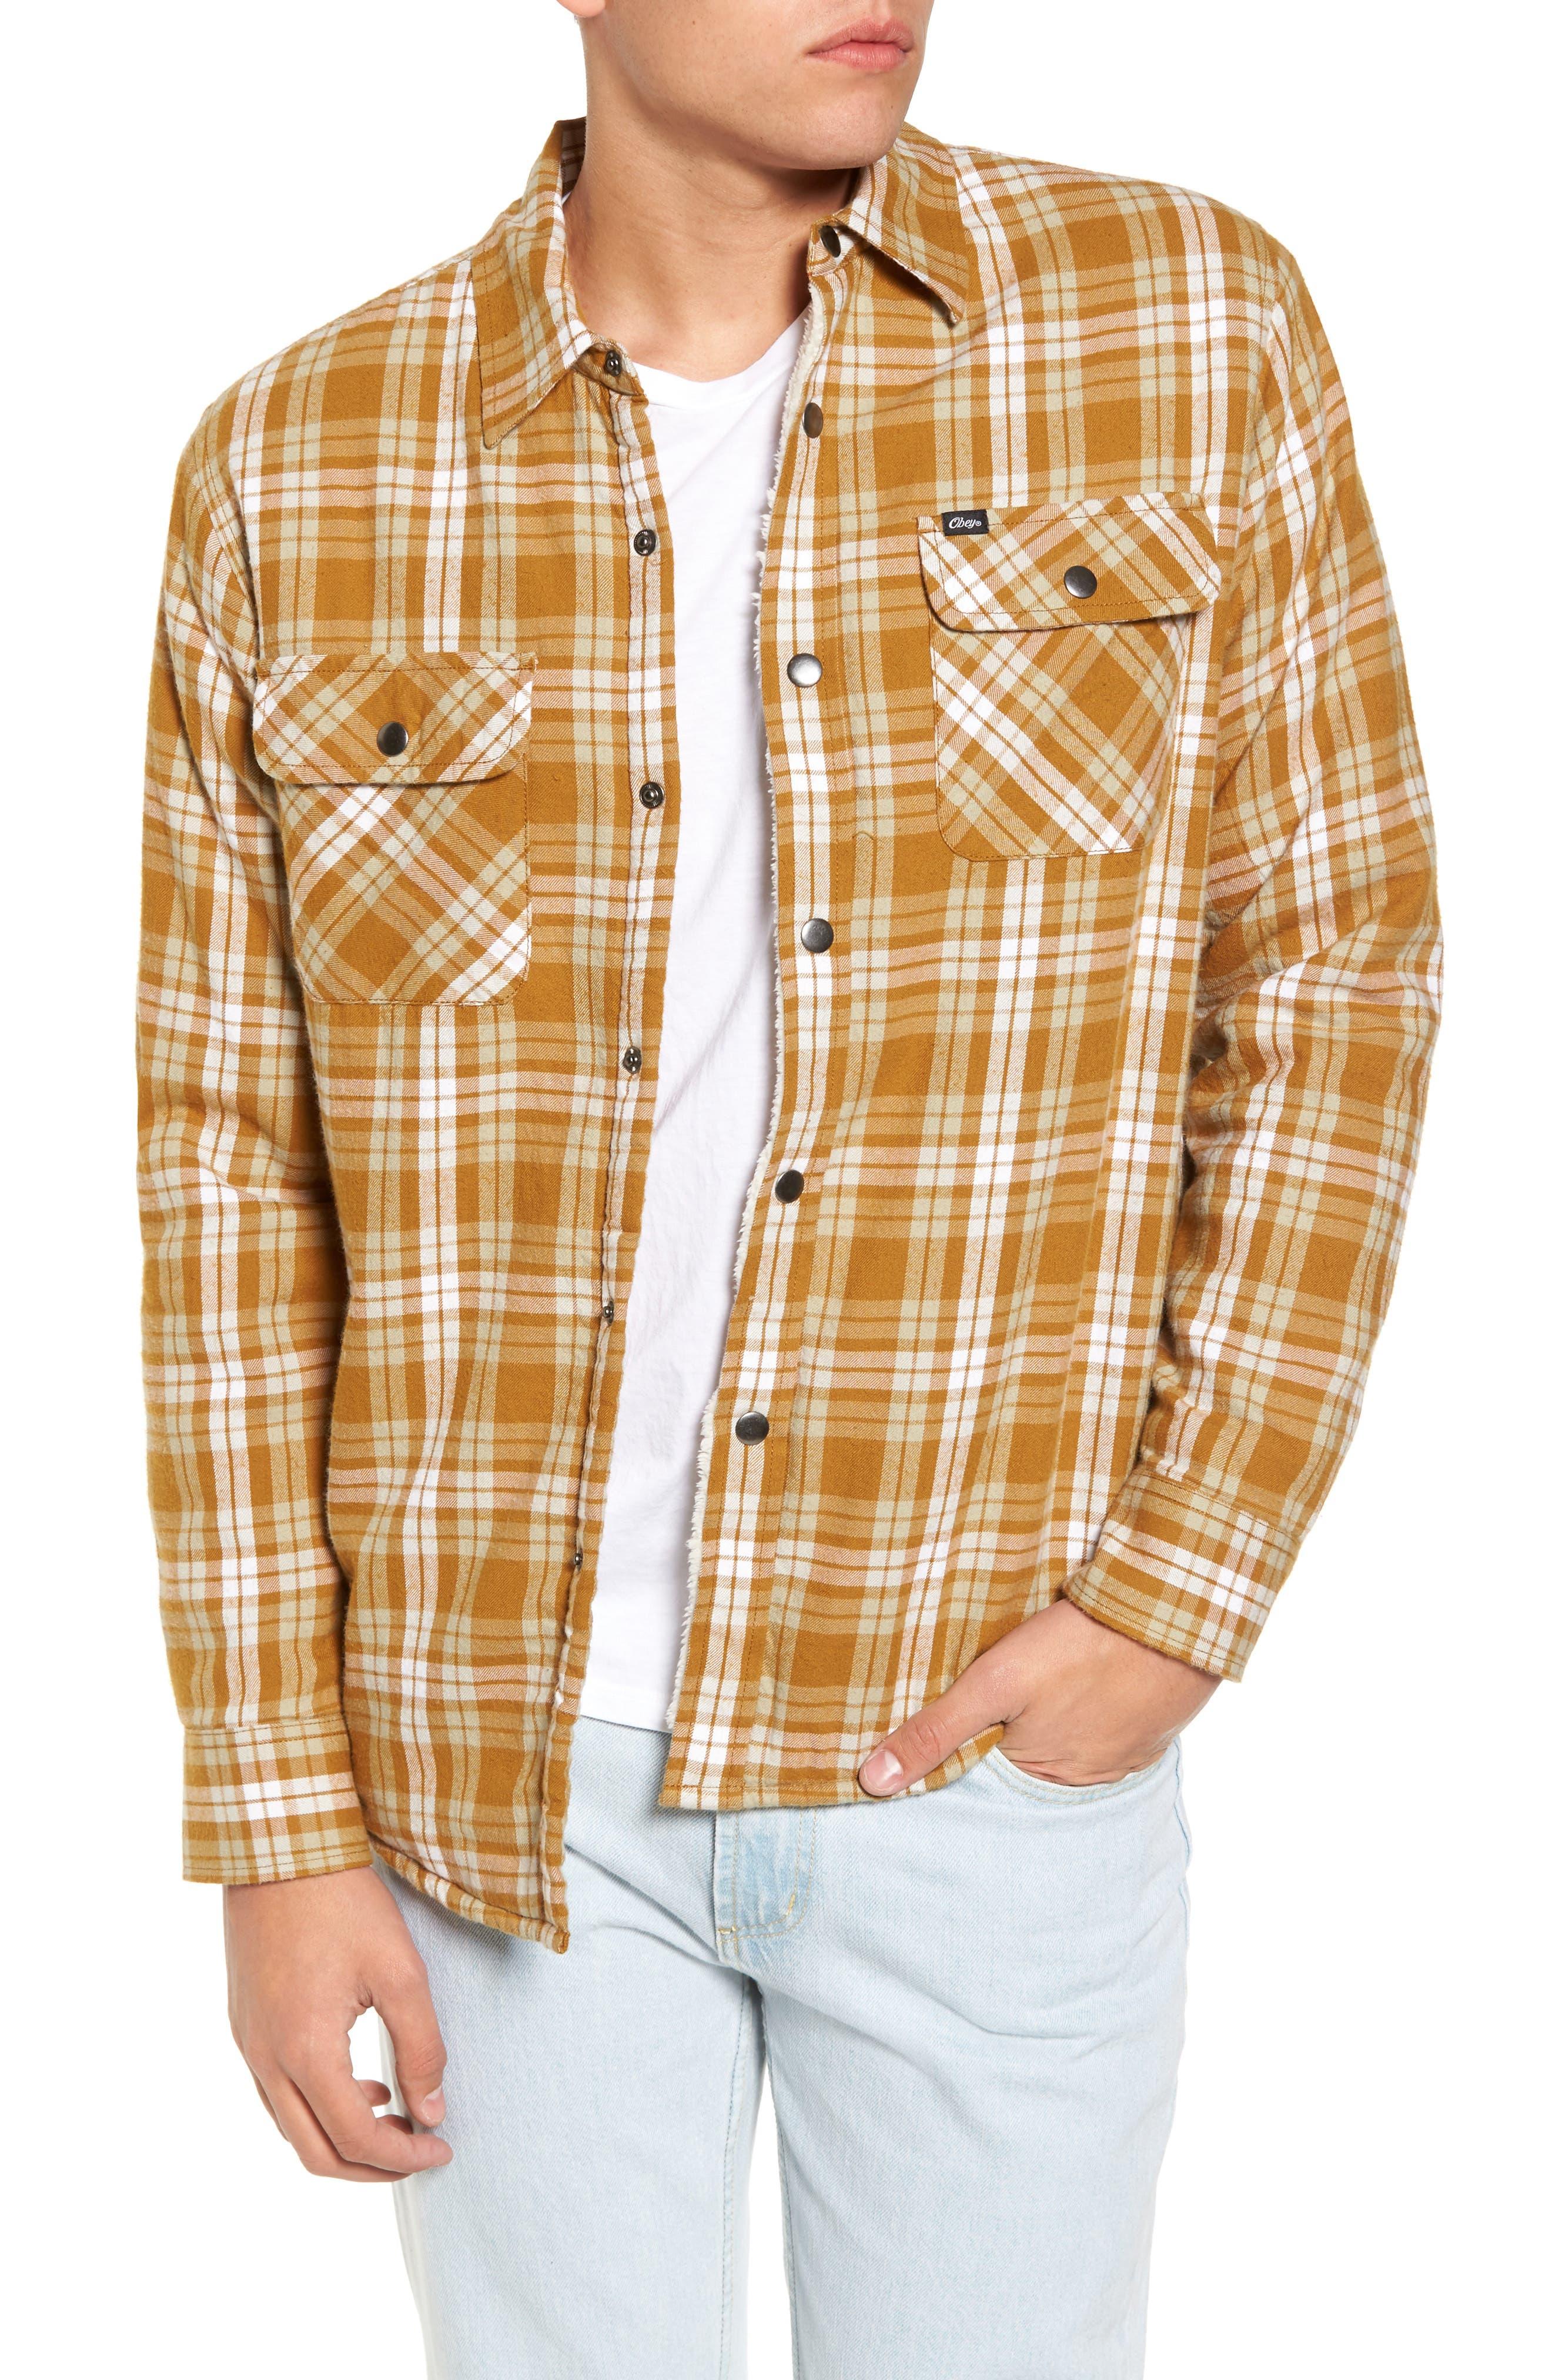 Alternate Image 1 Selected - Obey Seattle Shirt Jacket